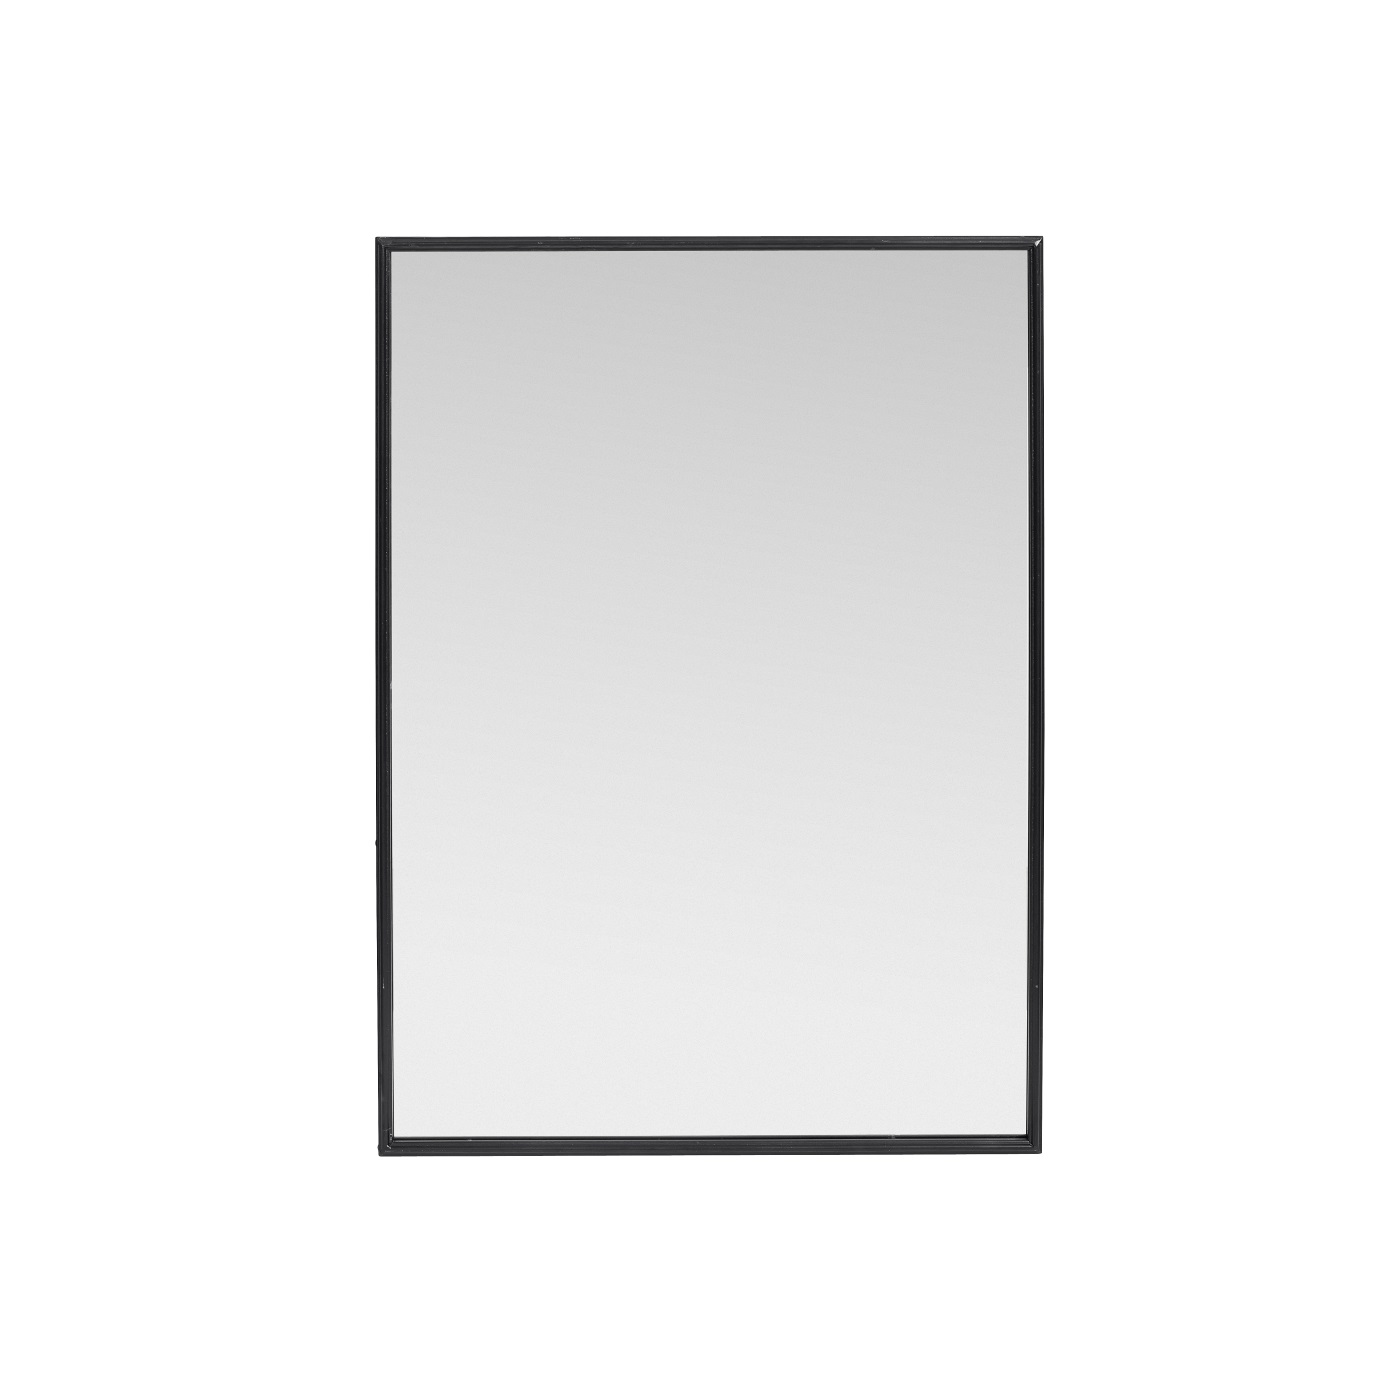 DOWNTOWN spegel Medium, Nordal